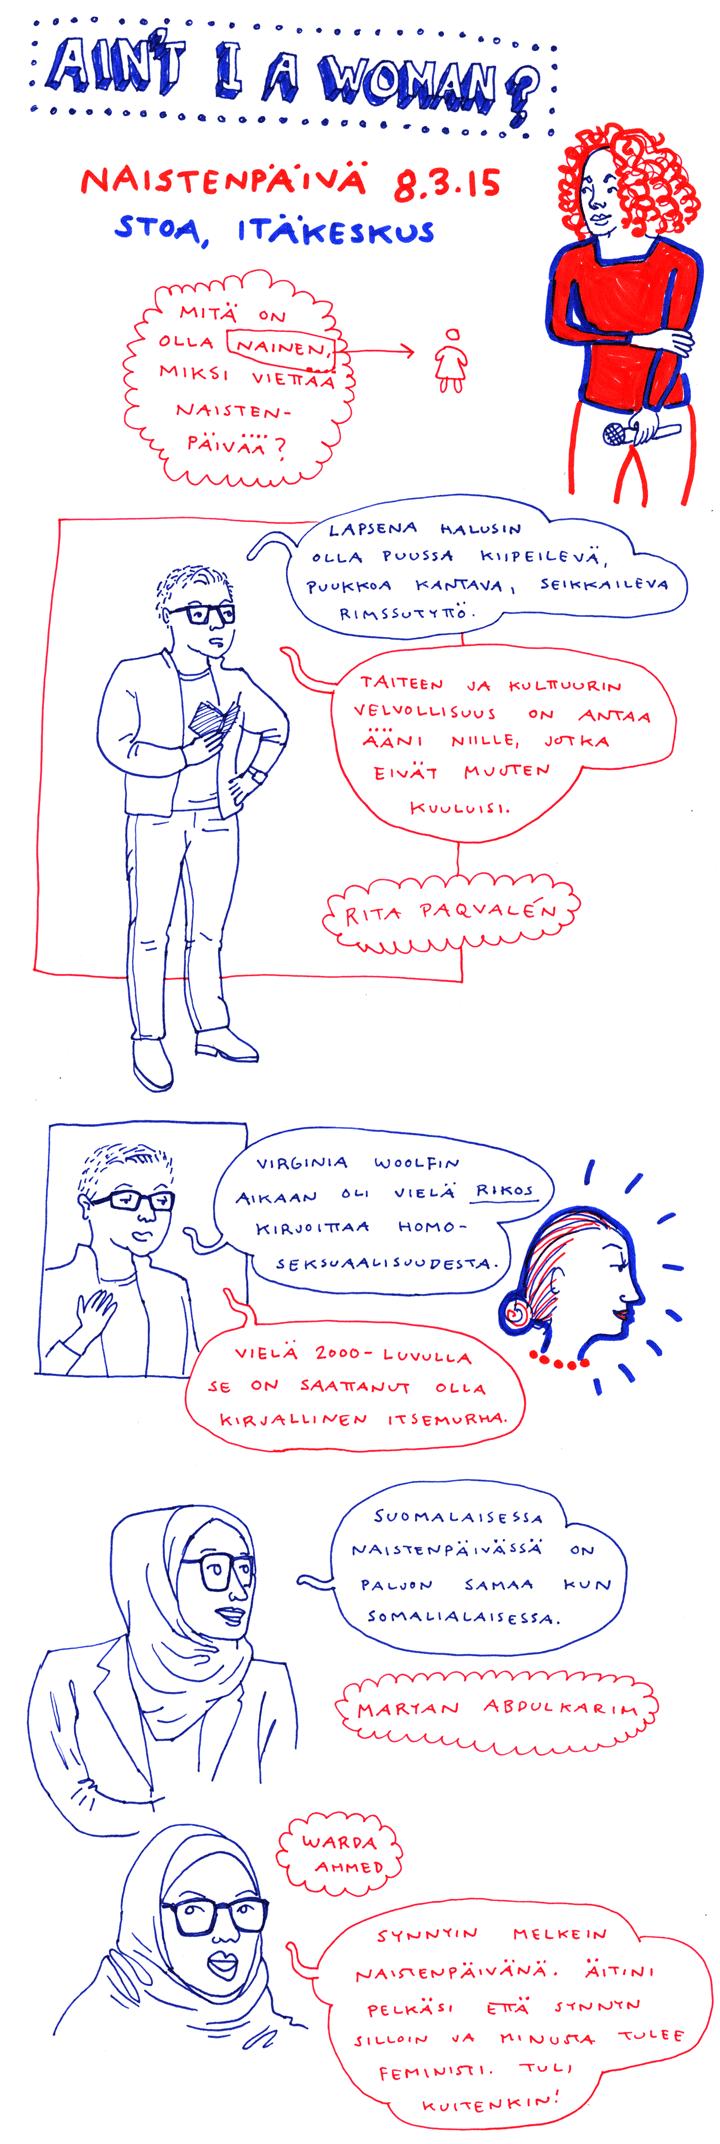 feminismi-antirasismi-x-1